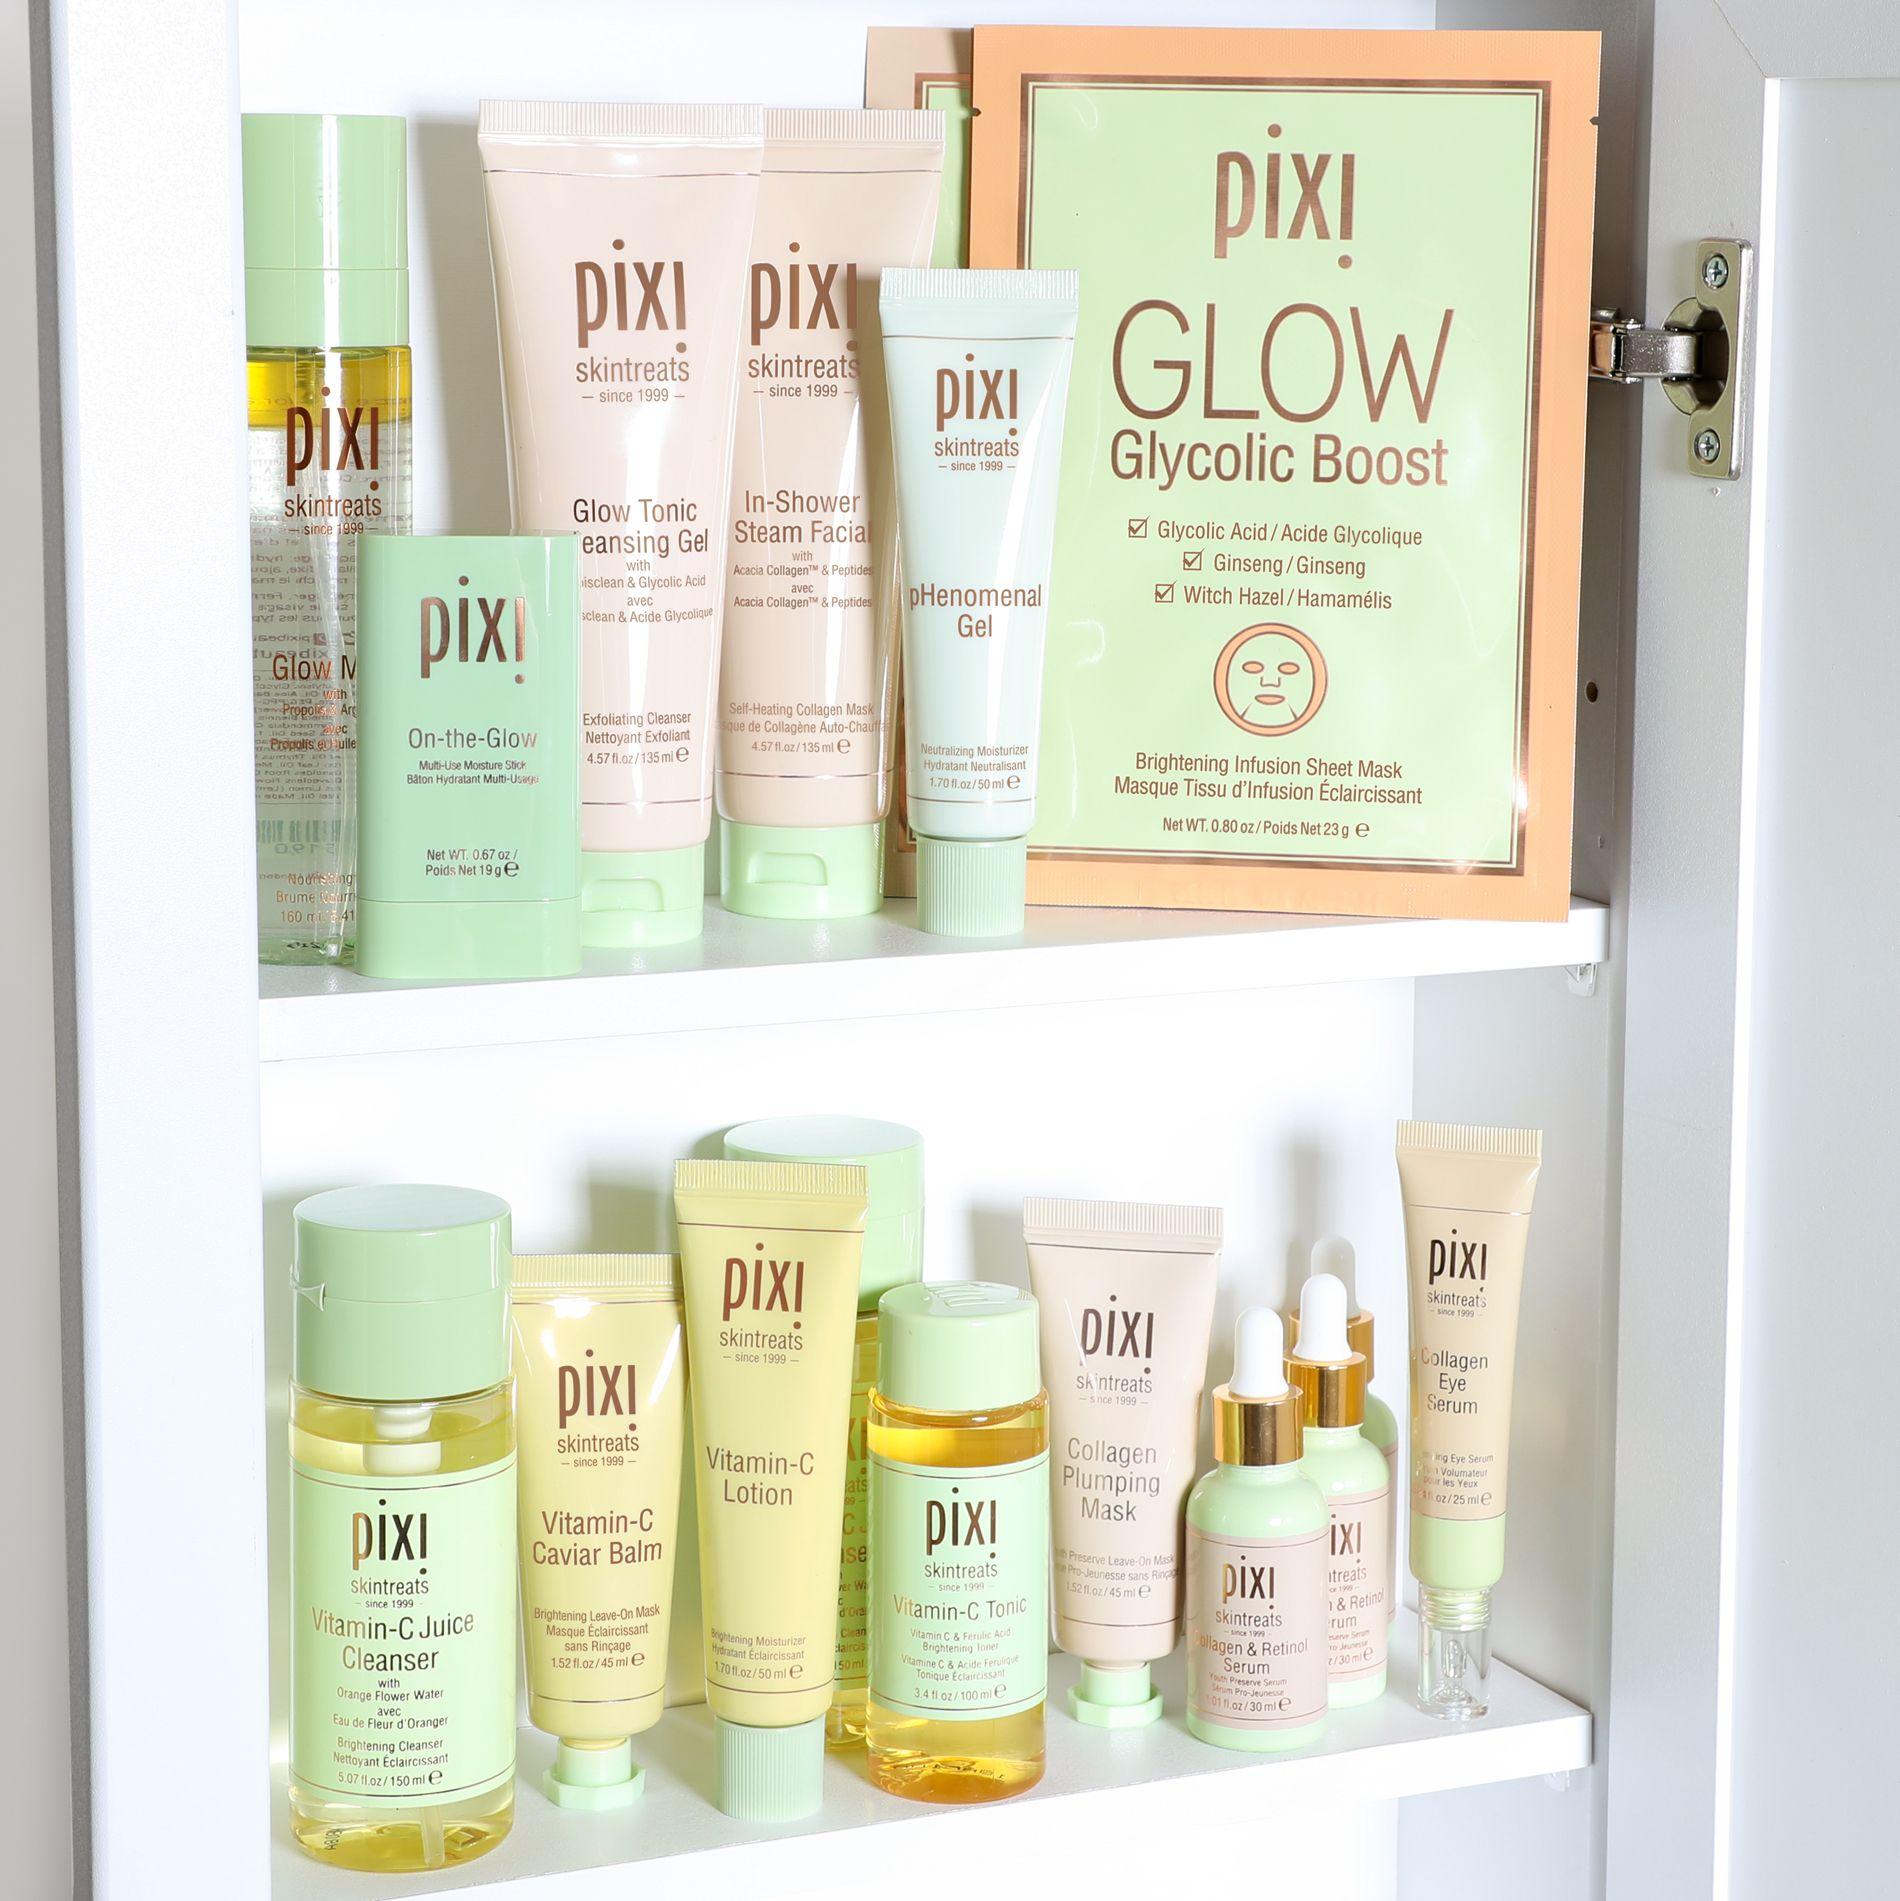 Skintreats Pixi Beauty Drugstore Skincare Pixi Beauty Pixi Glow Tonic